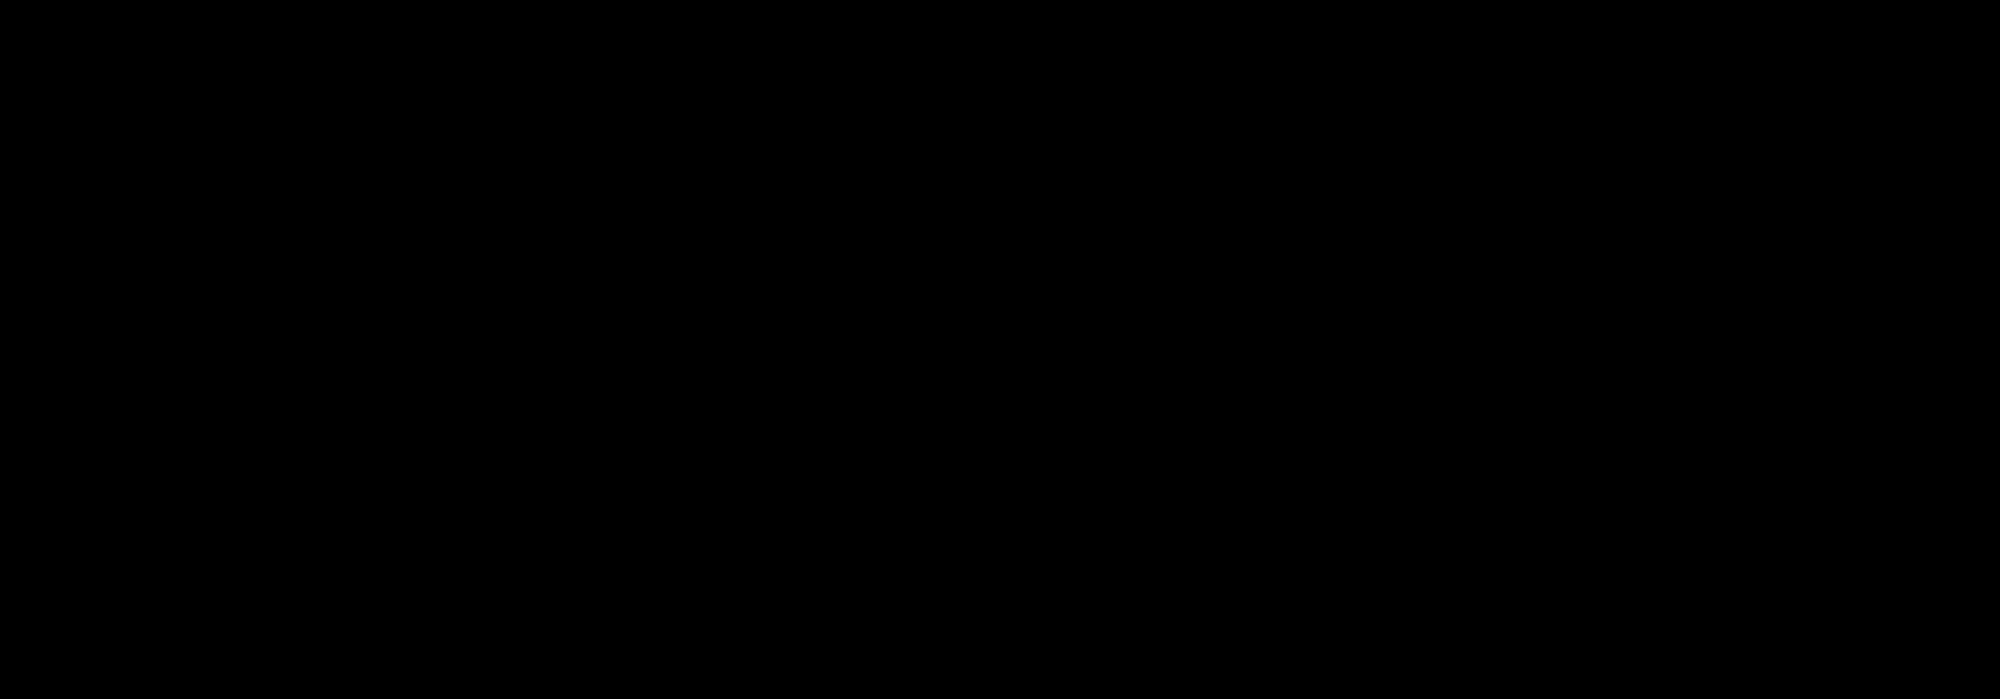 Keys PNG Black And White - 153907